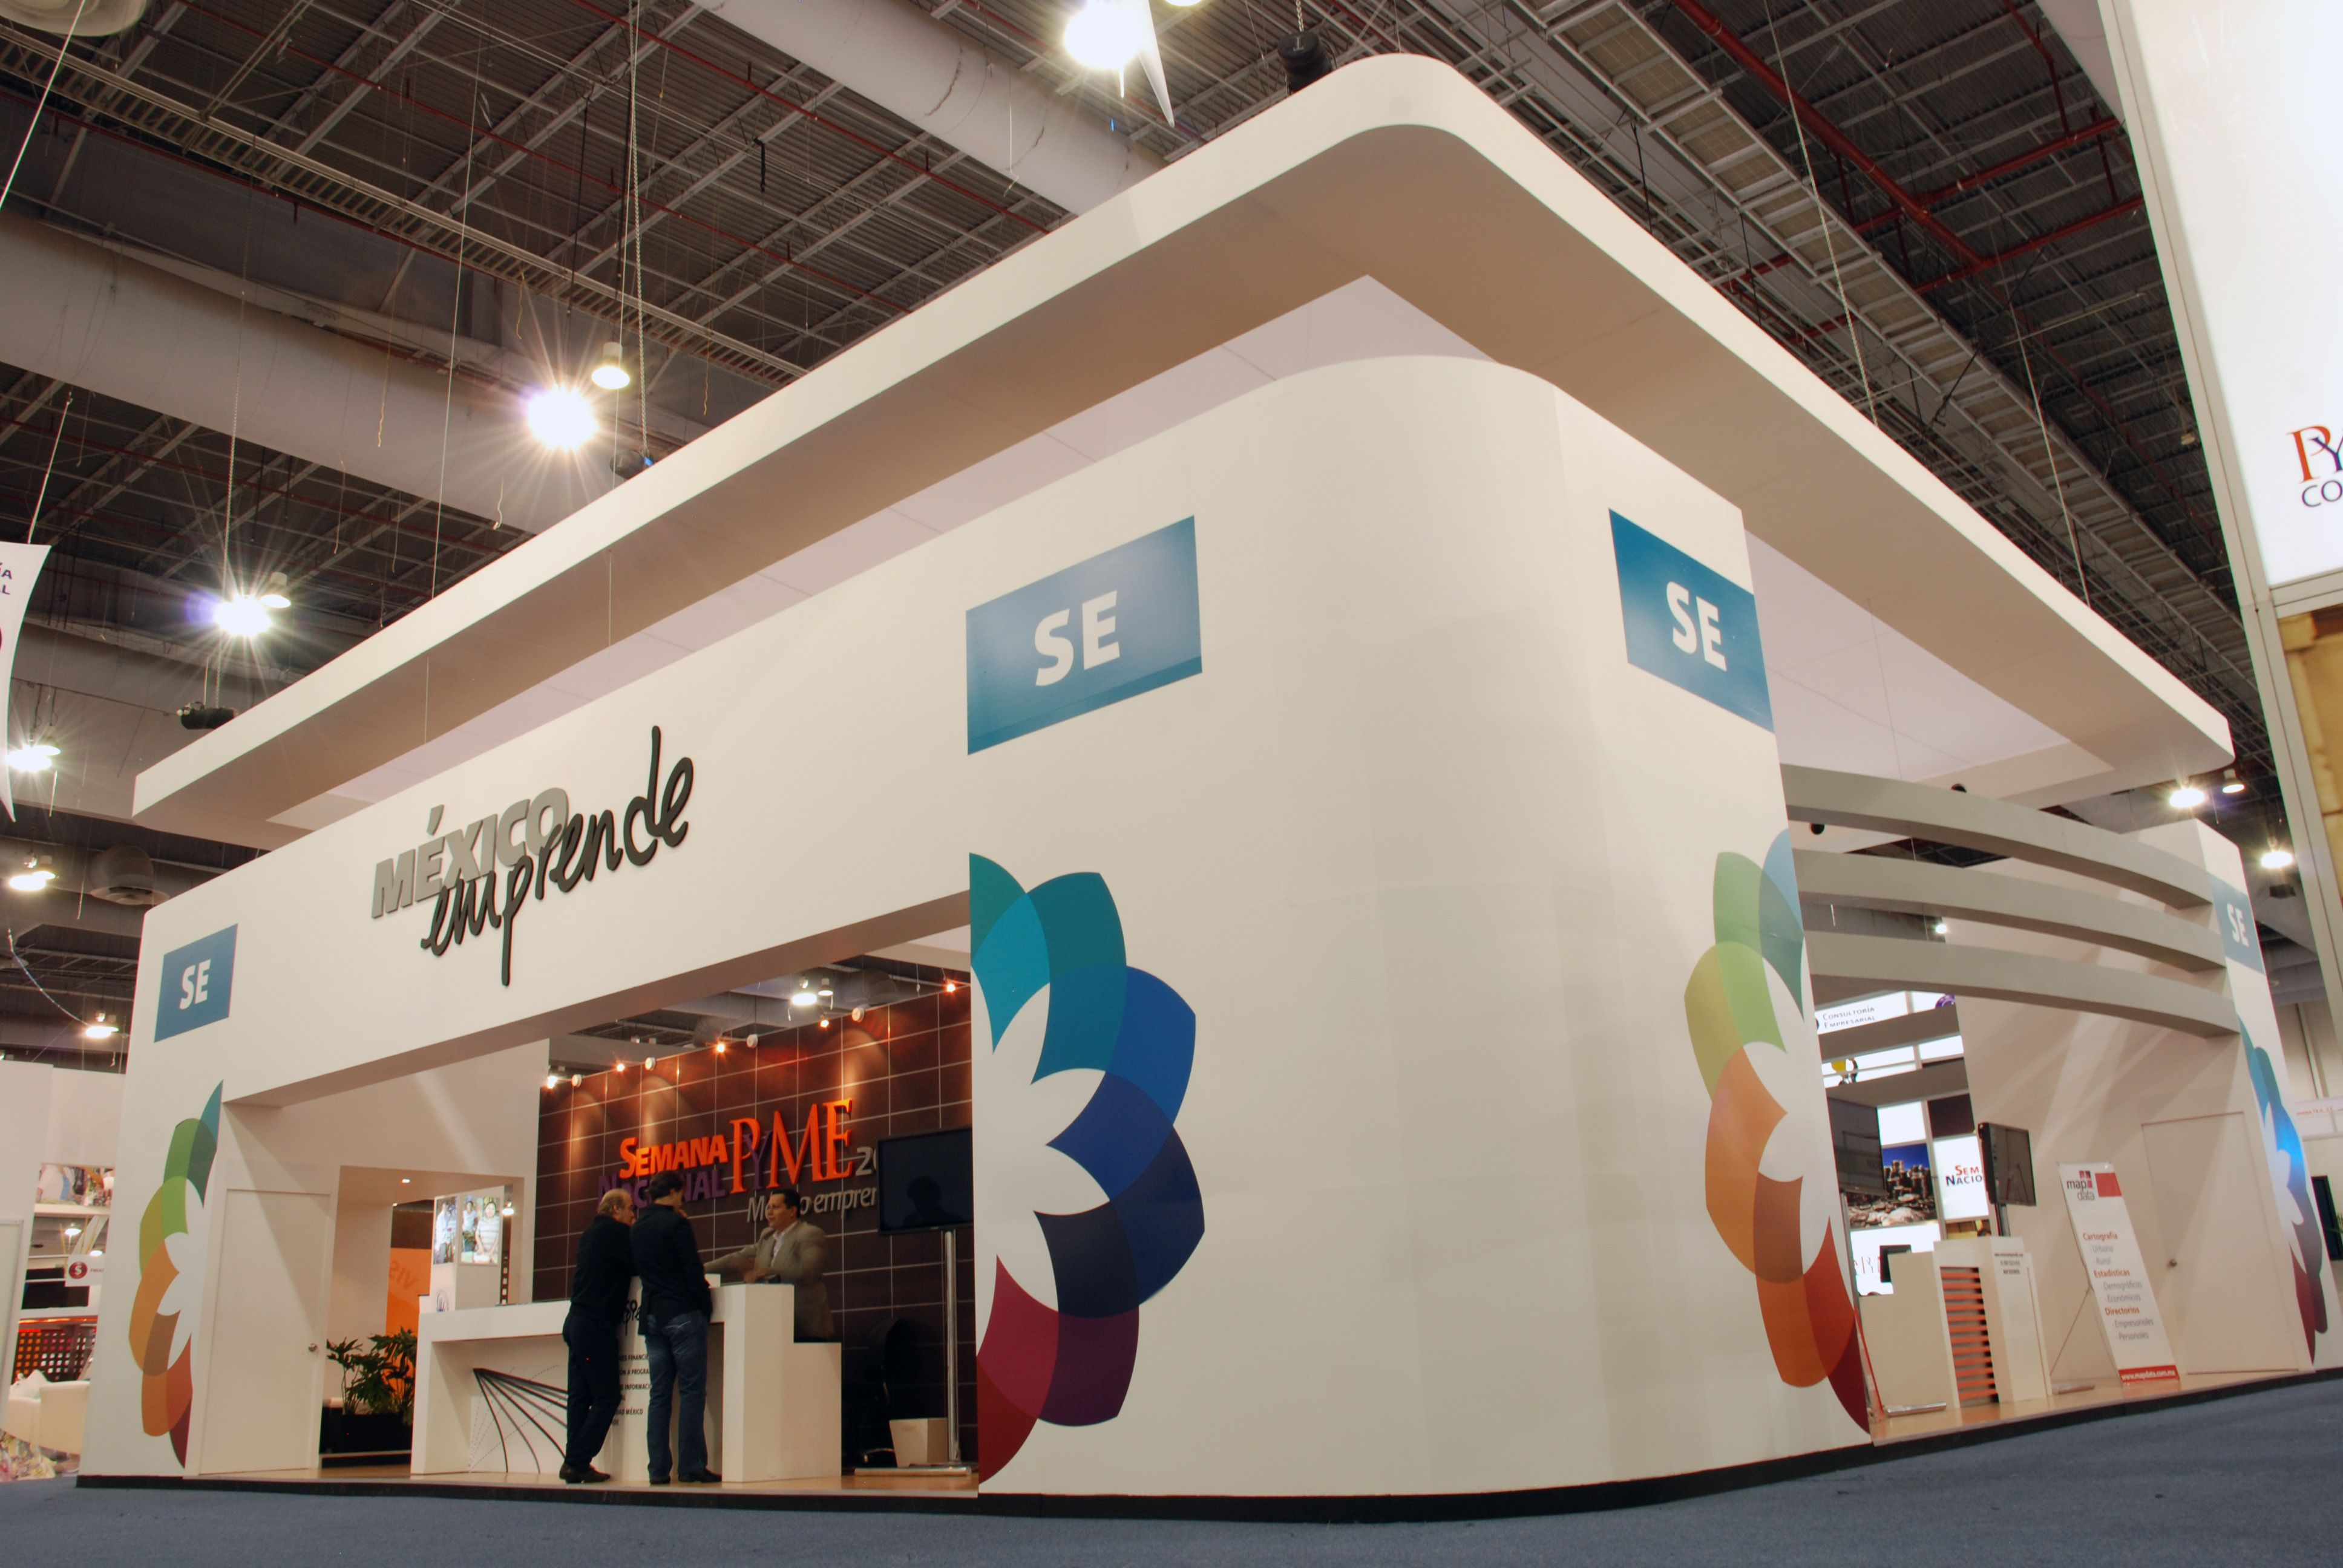 Expo asesores for Asesores exterior